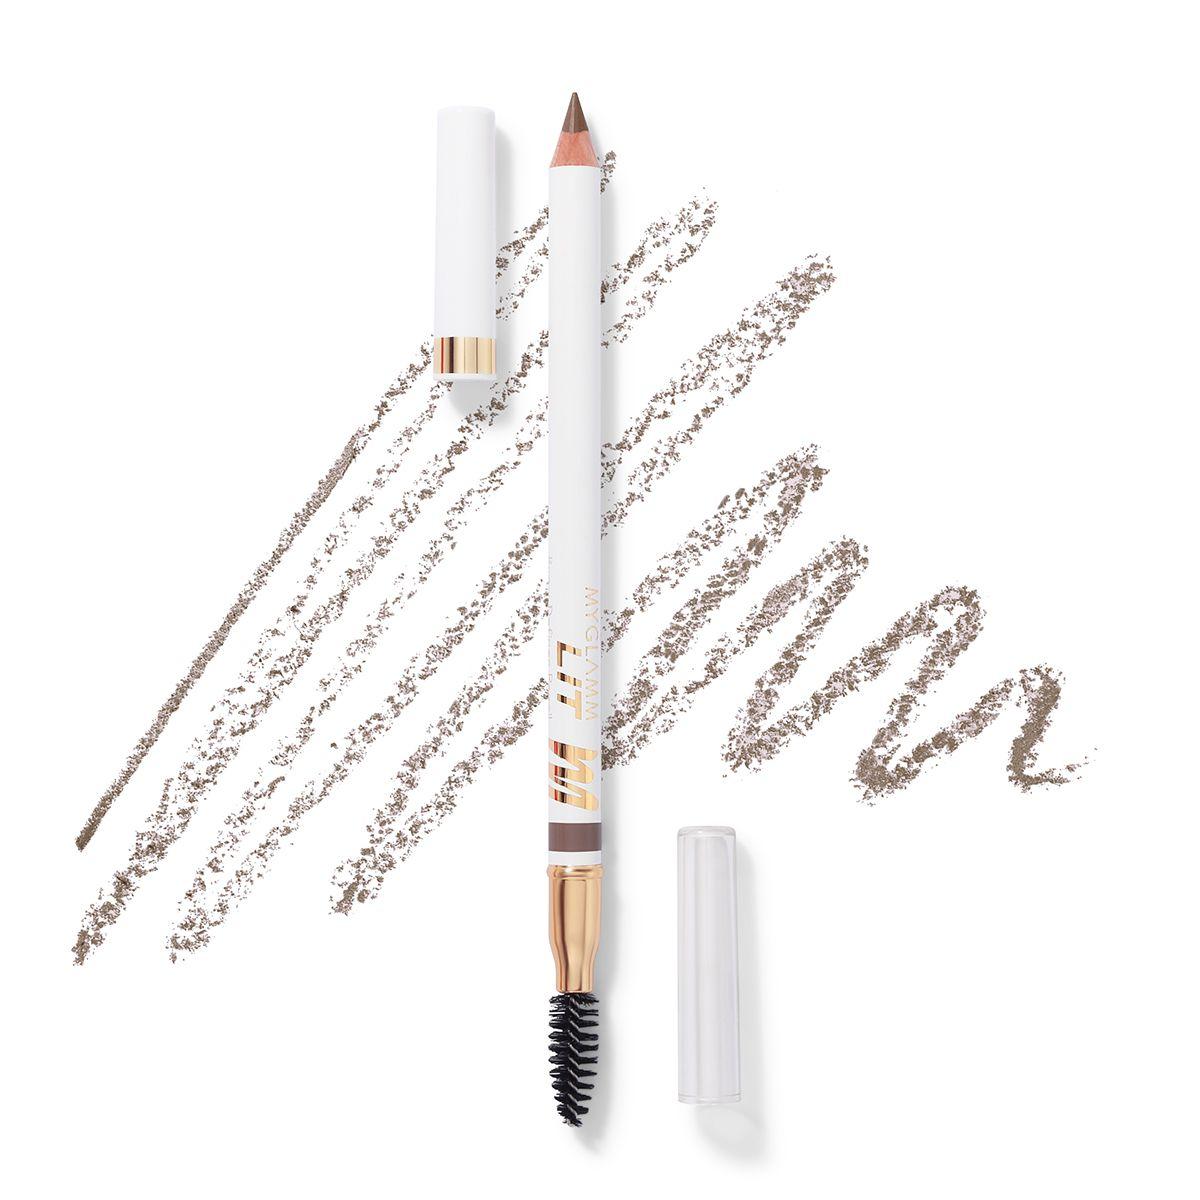 LIT Brow Pencil - MyGlamm